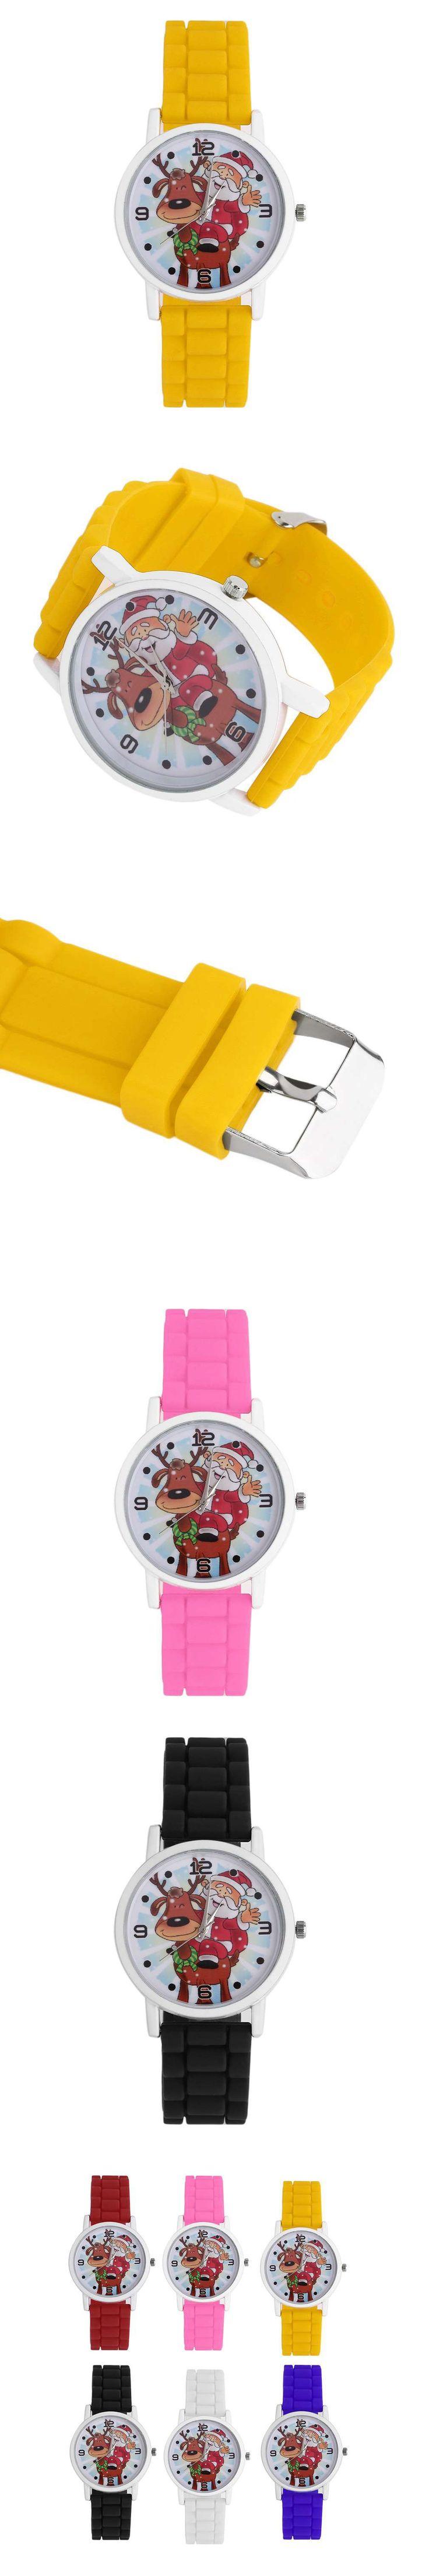 Festival Christmas Children Watch Kids Cute Deer Silicone Band Strap Quartz WristWatch Boys Girls Great Gift Watch Size 2 $2.48